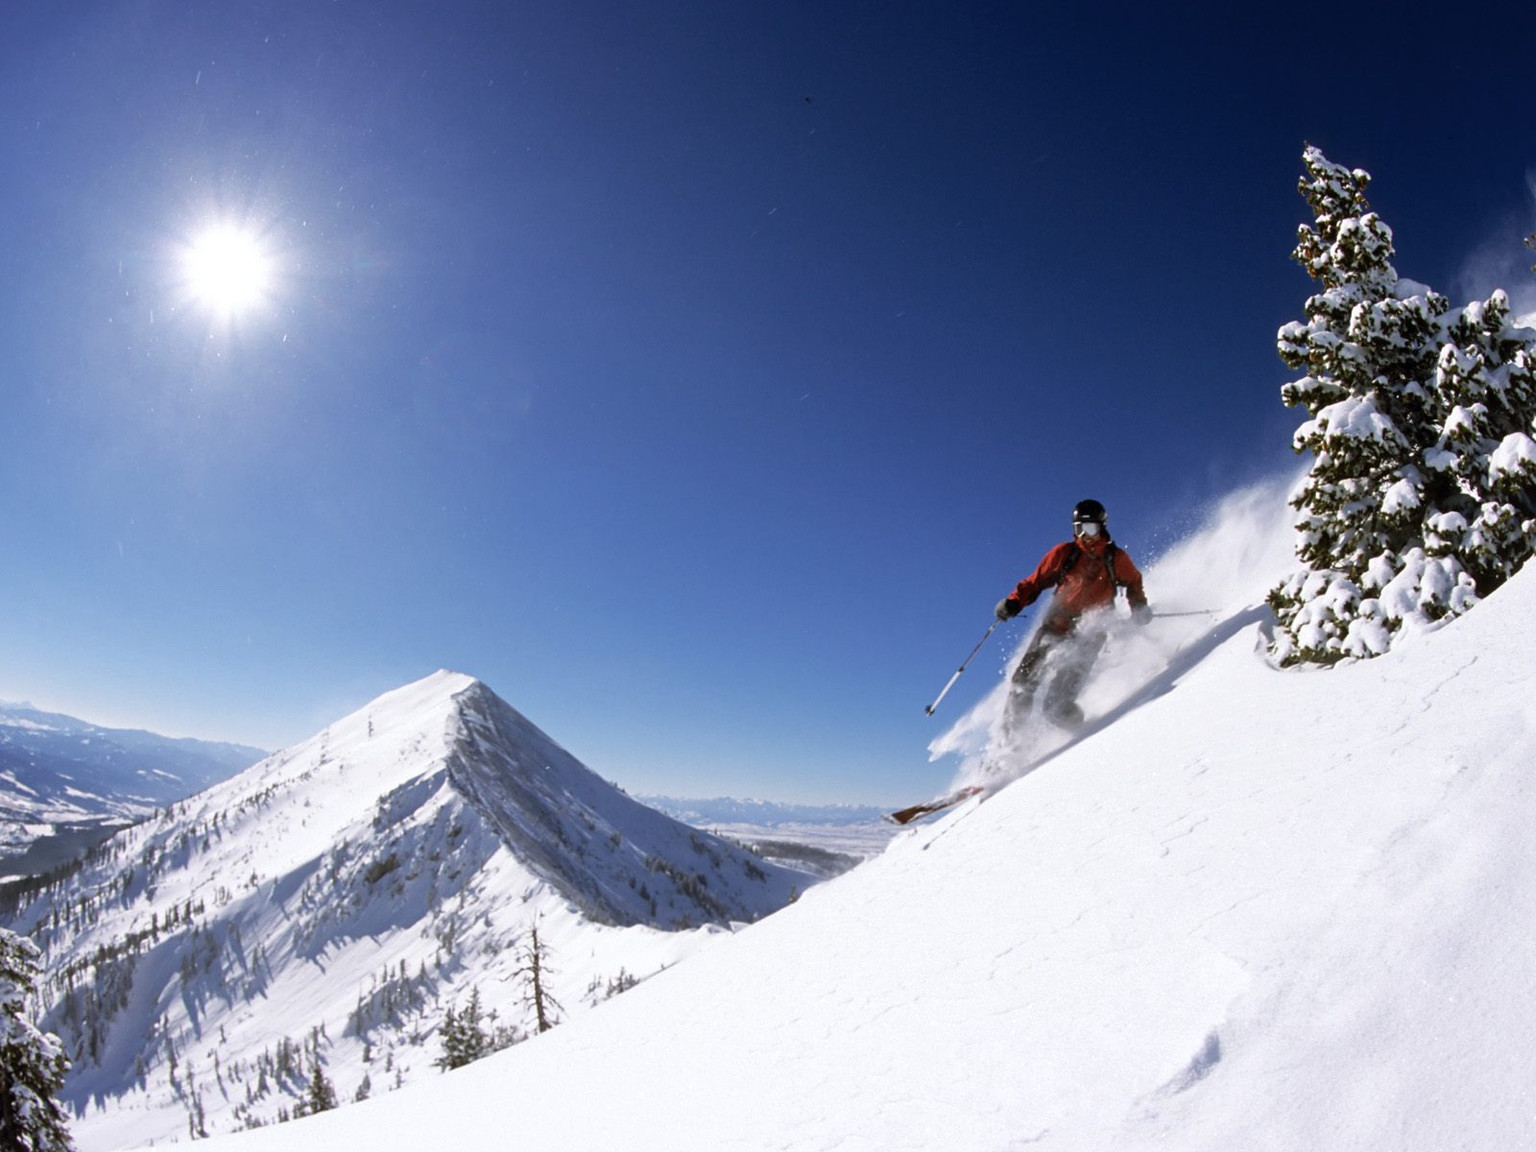 ws_Telemark_Skiing_1600x1200 (1).jpg